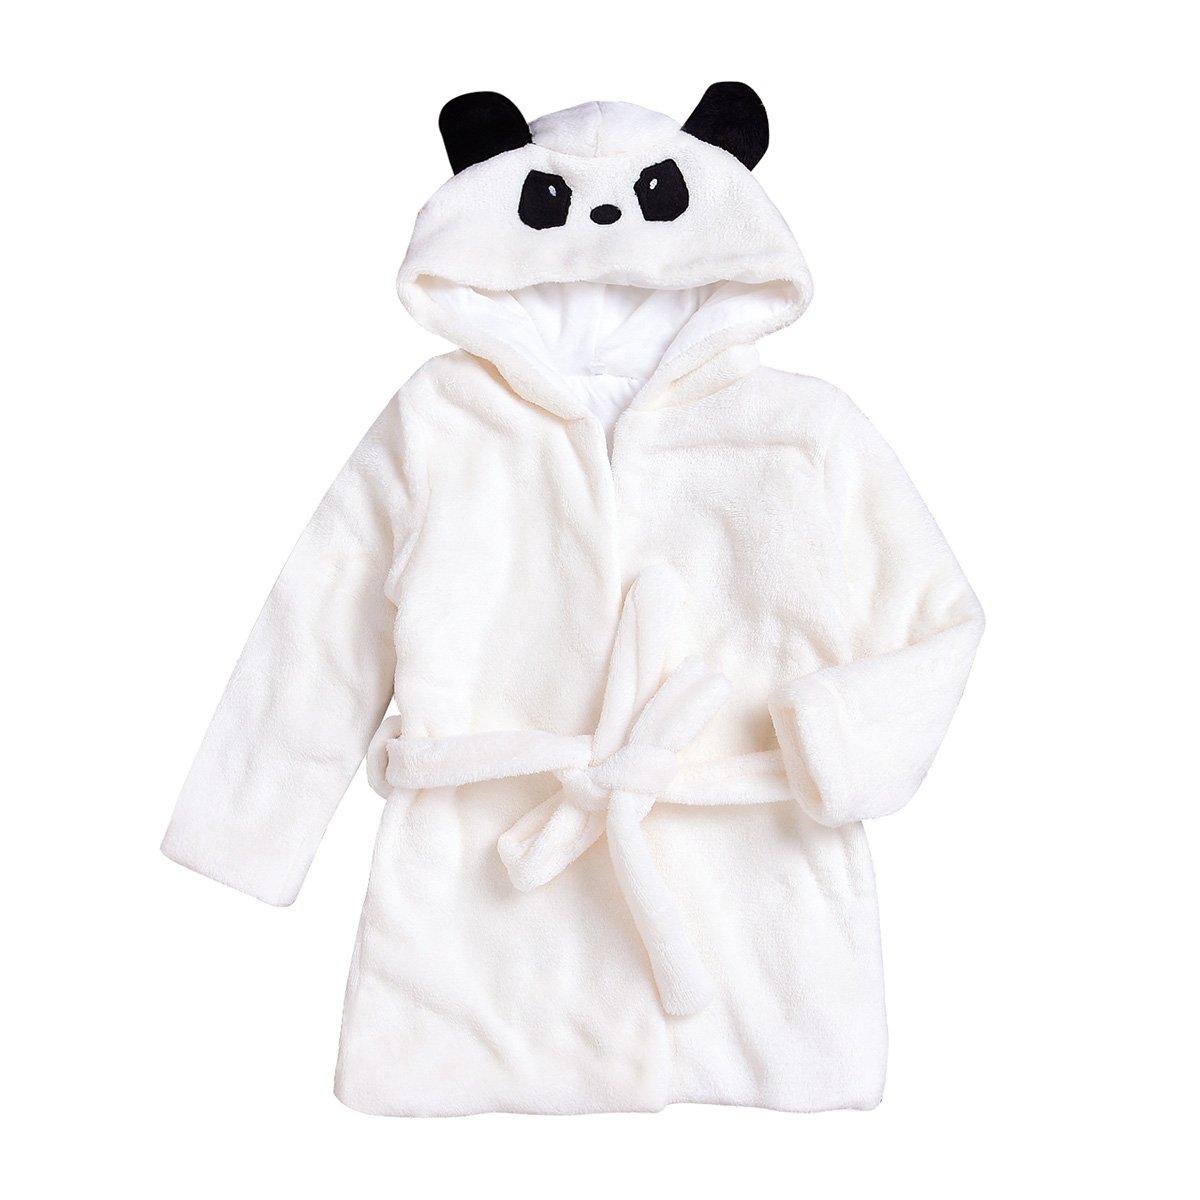 puseky Toddler Kid Boys Girls Cute Panda Hooded Bathrobe Sleepwear Dressing Gown (White, 3T-4T)